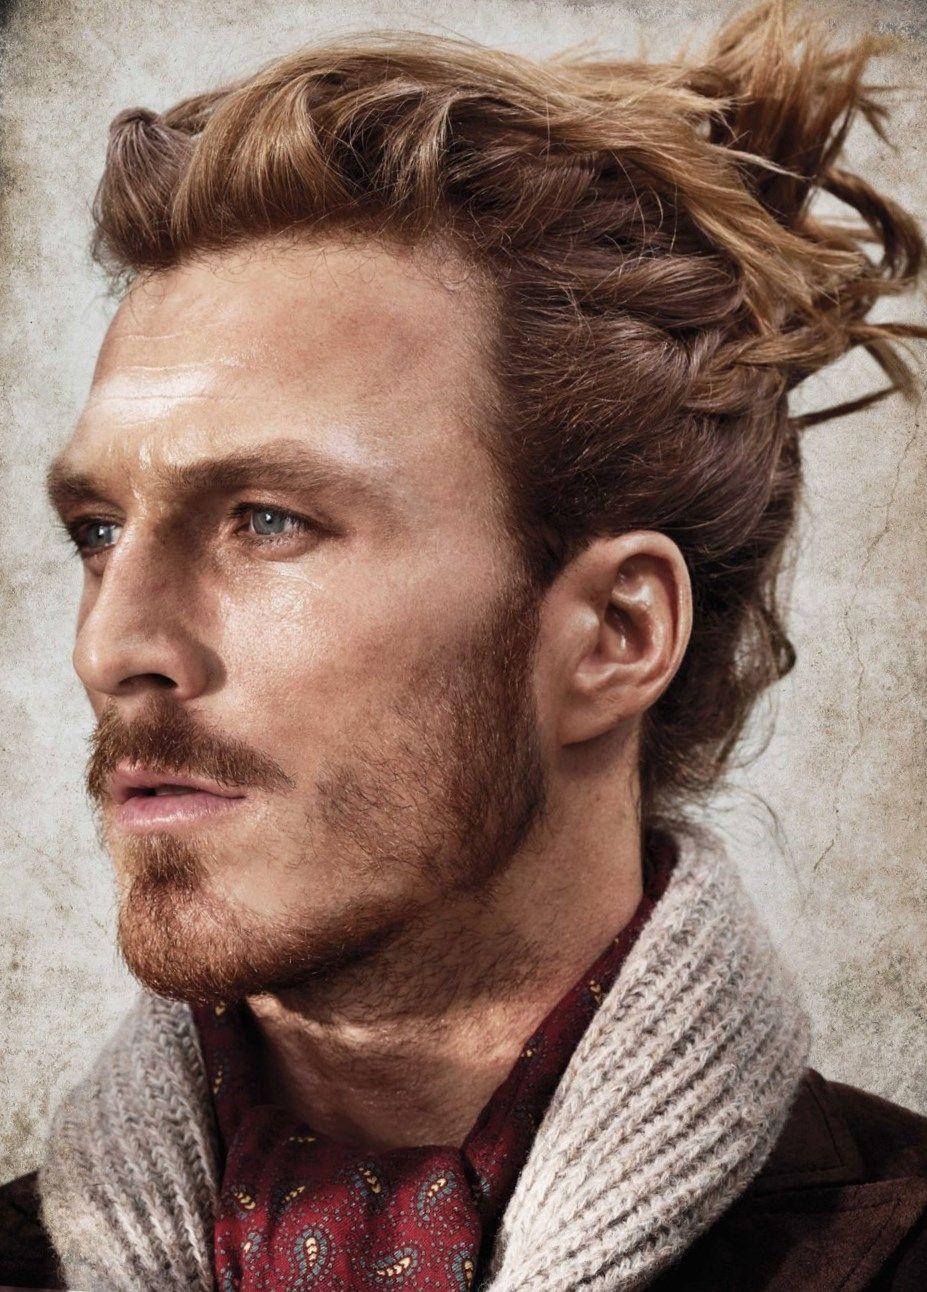 Stylische Frisuren Männer  Pin by Karina Malikova on Frisurentrends 2016